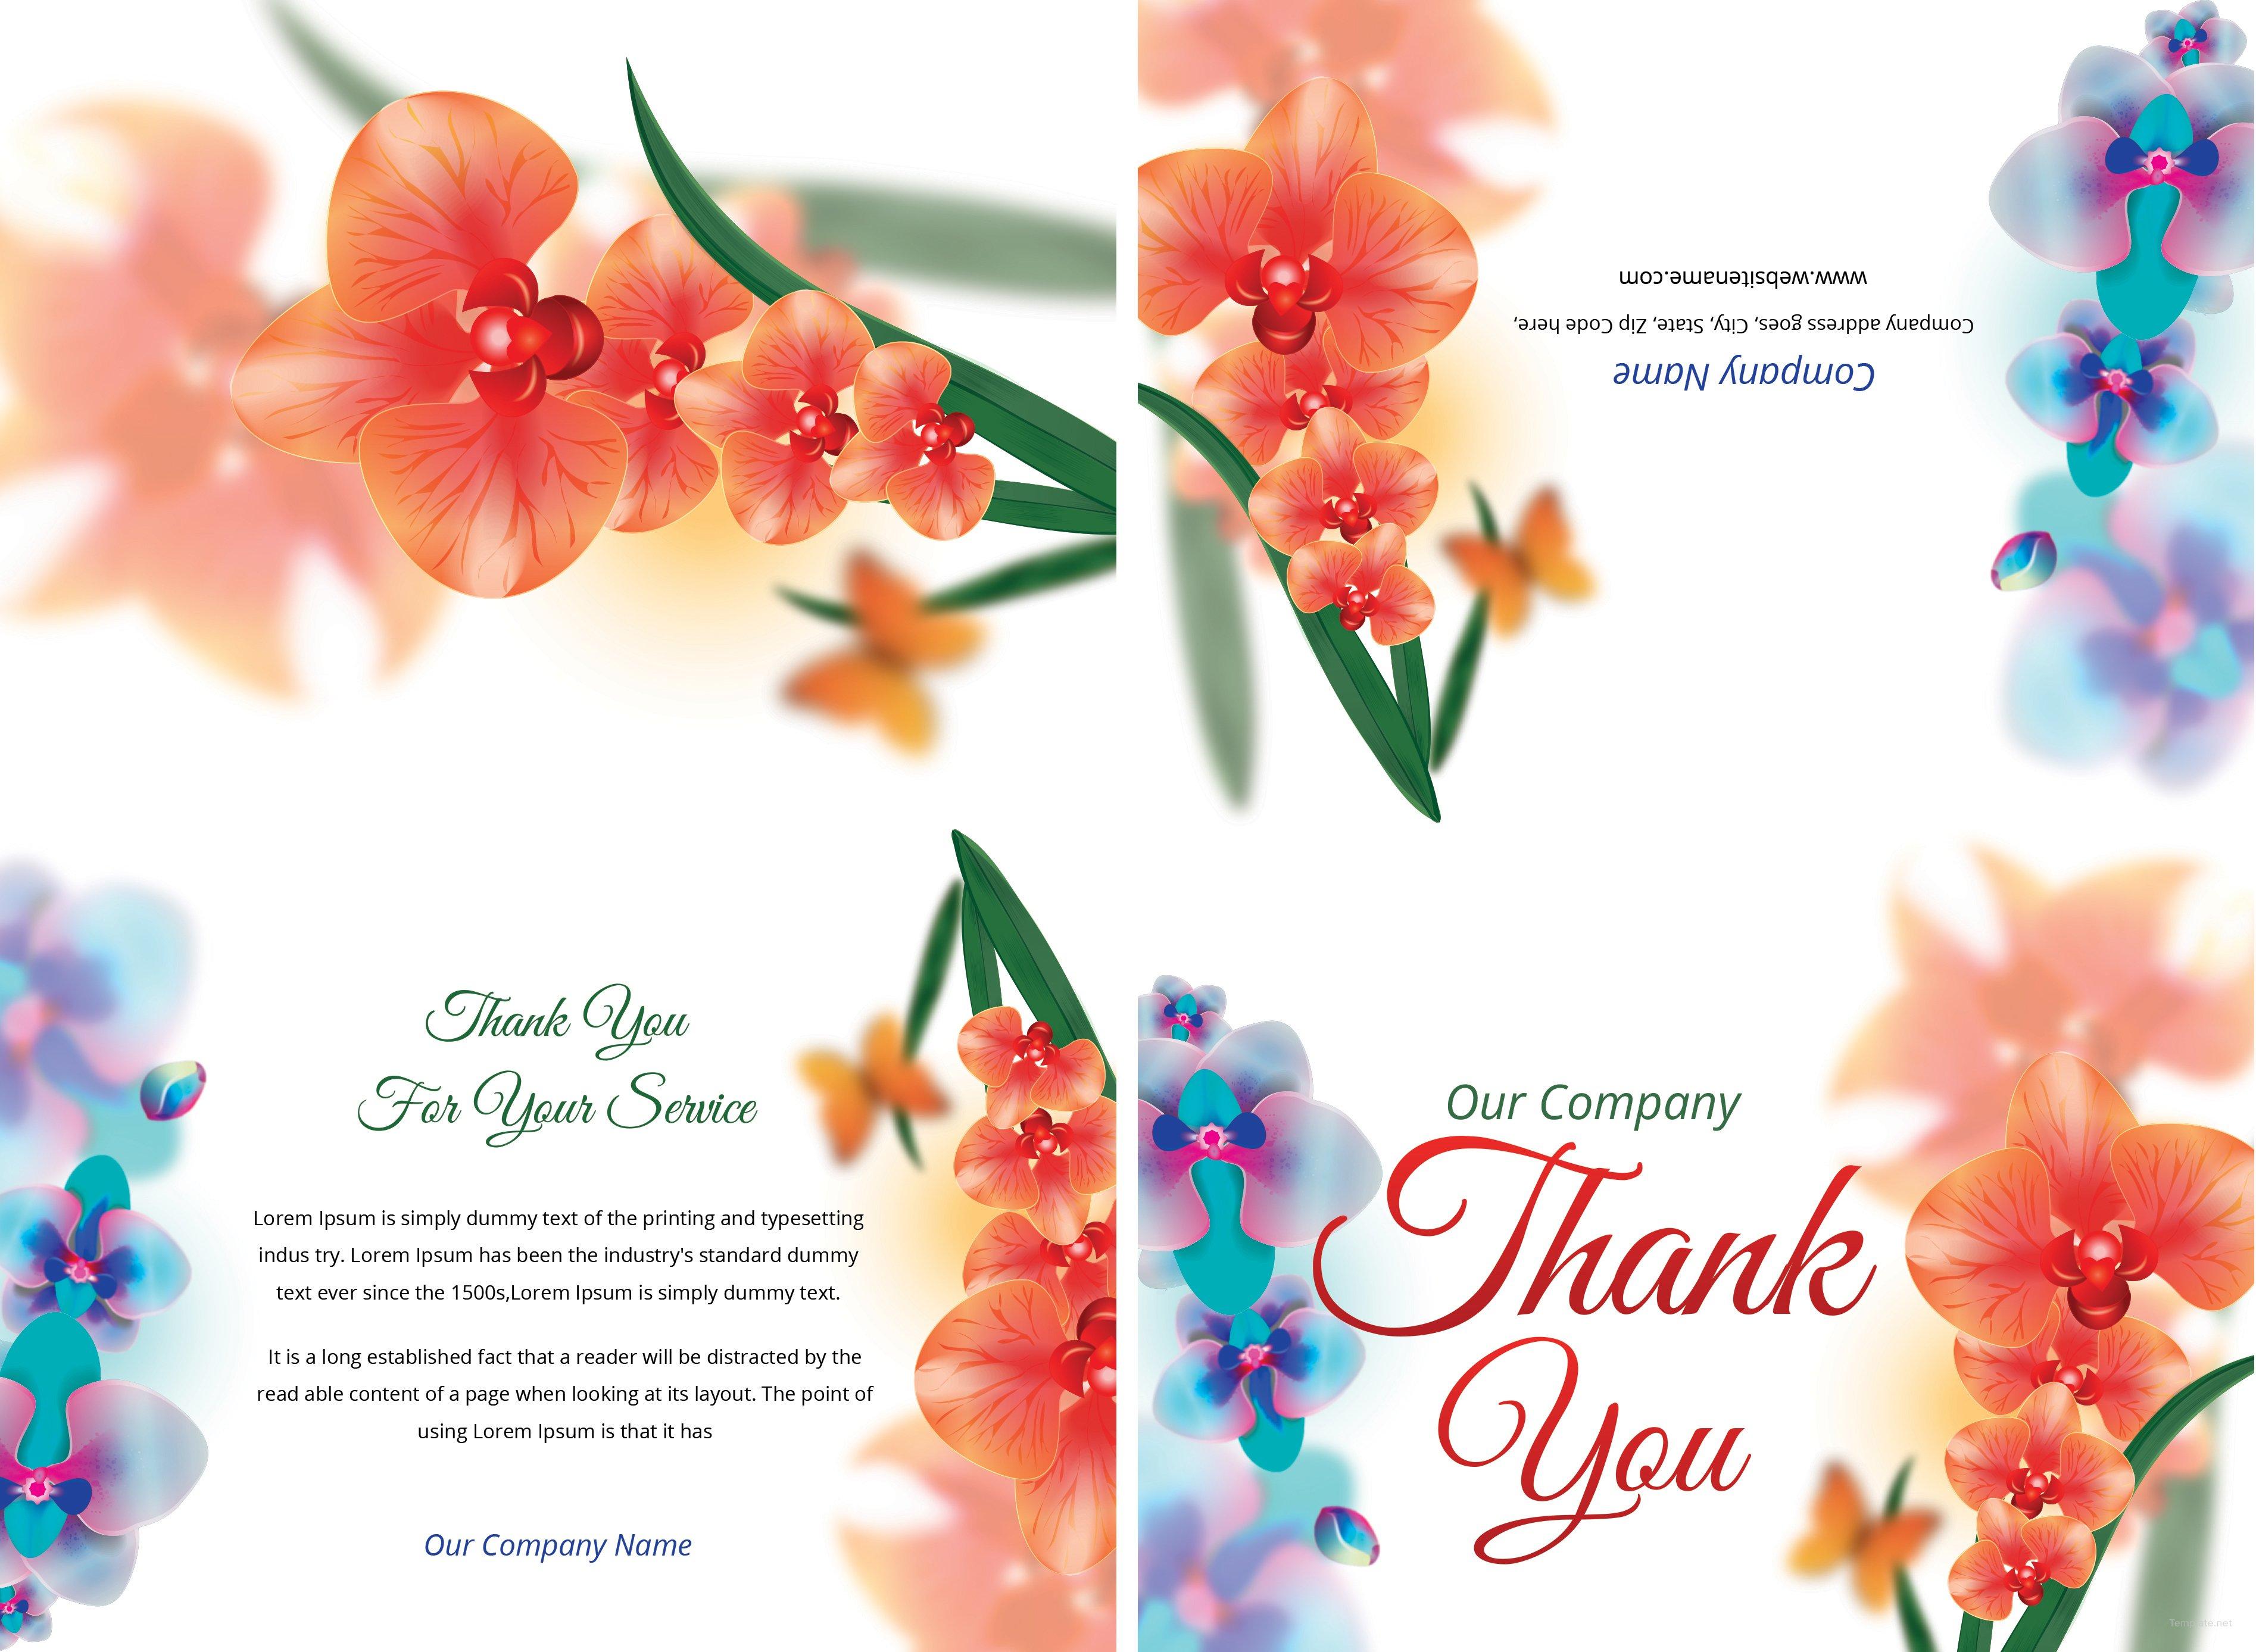 Free Bi-fold Thank You Card Template in Adobe Photoshop ...